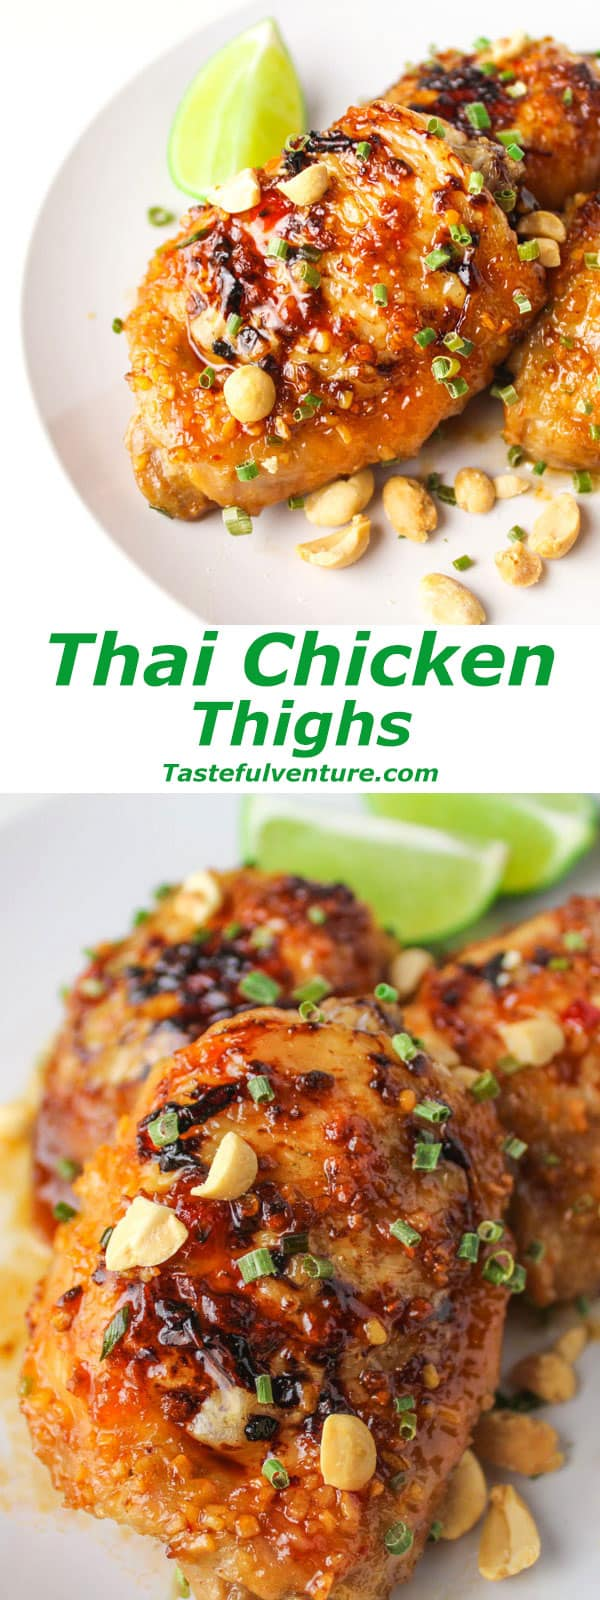 Thai chicken thighs tastefulventure thai chicken thighs that are super easy to make and finger lickin good forumfinder Image collections